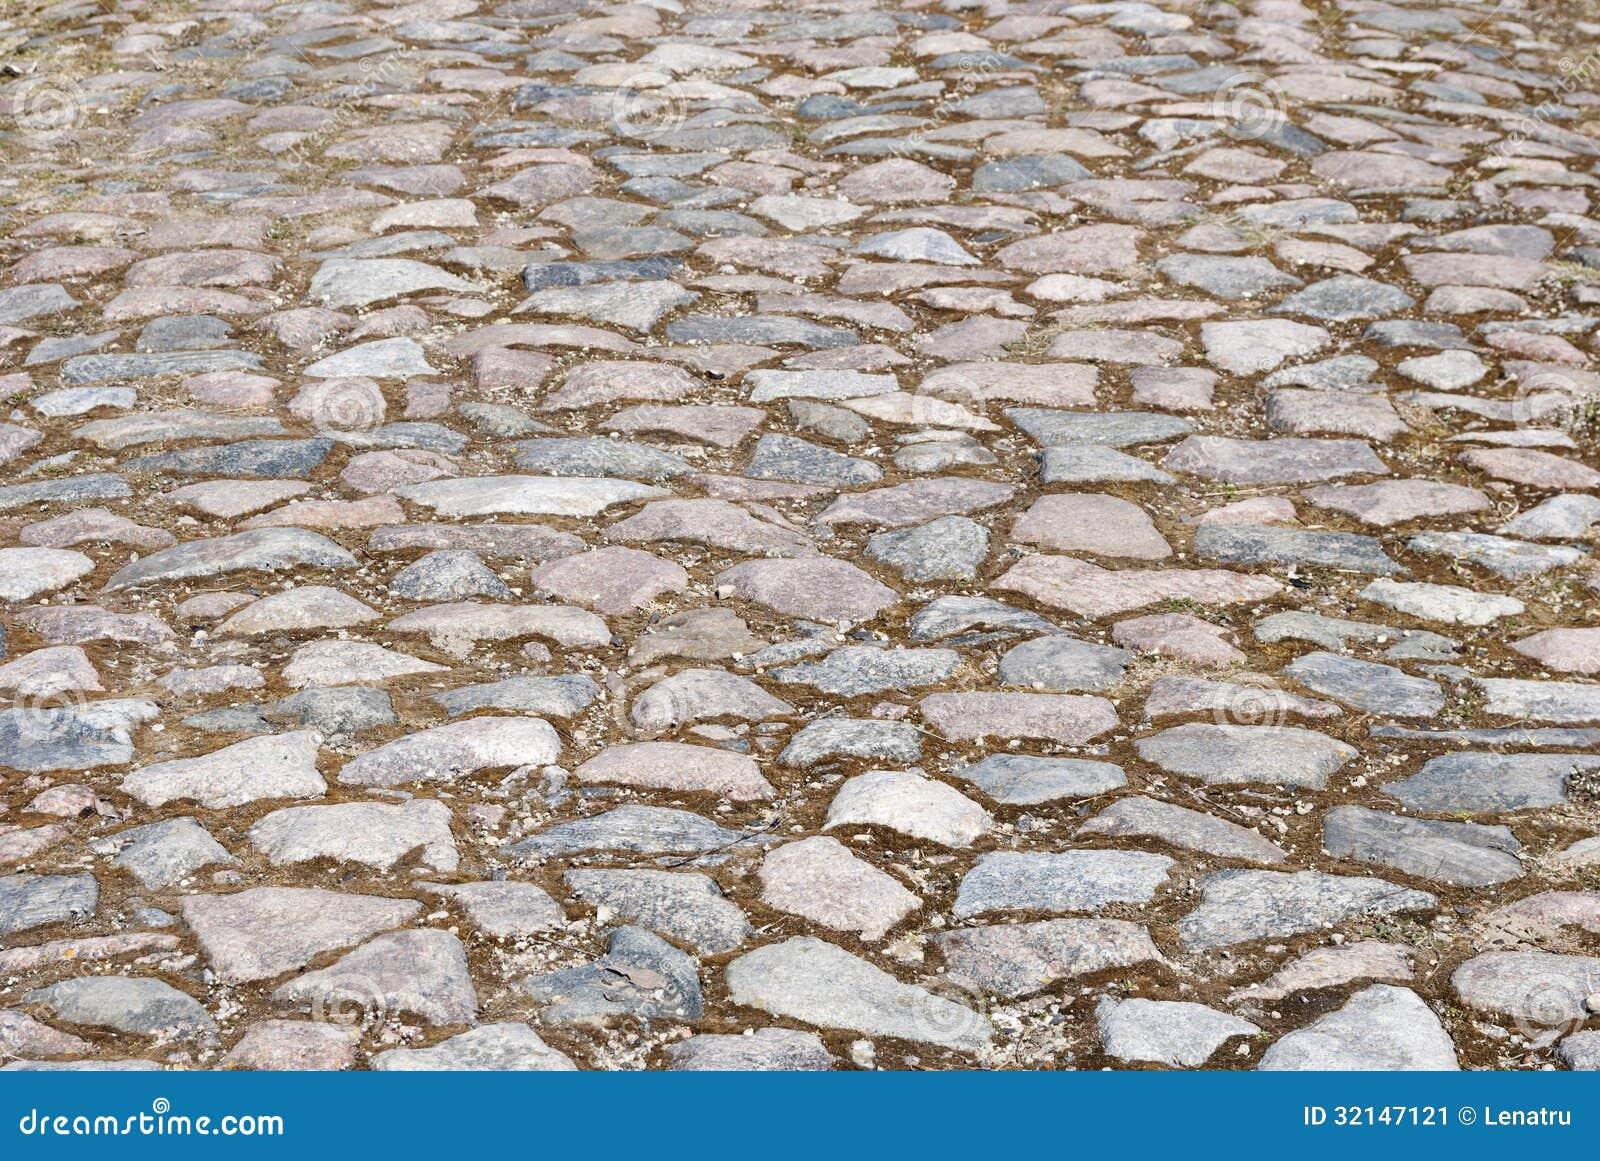 Stone Road Texture Stock Image Image 32147121